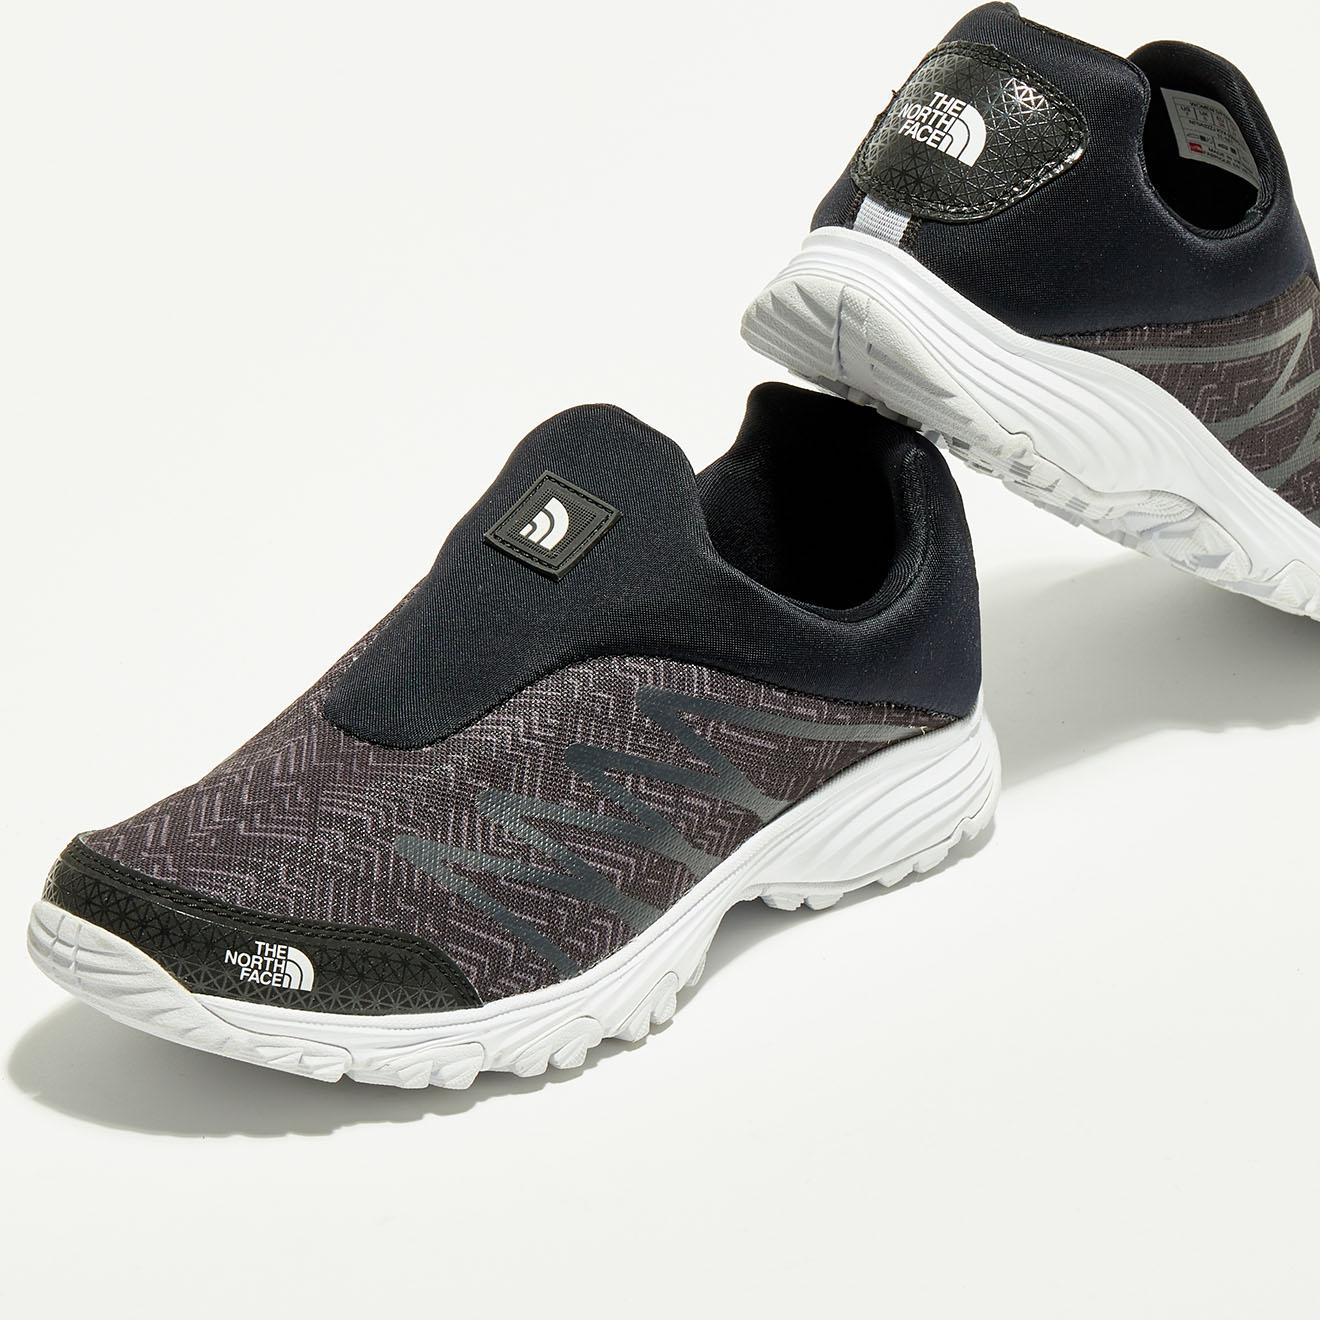 Sneakers trekking Venture Memo - The North Face - Modalova